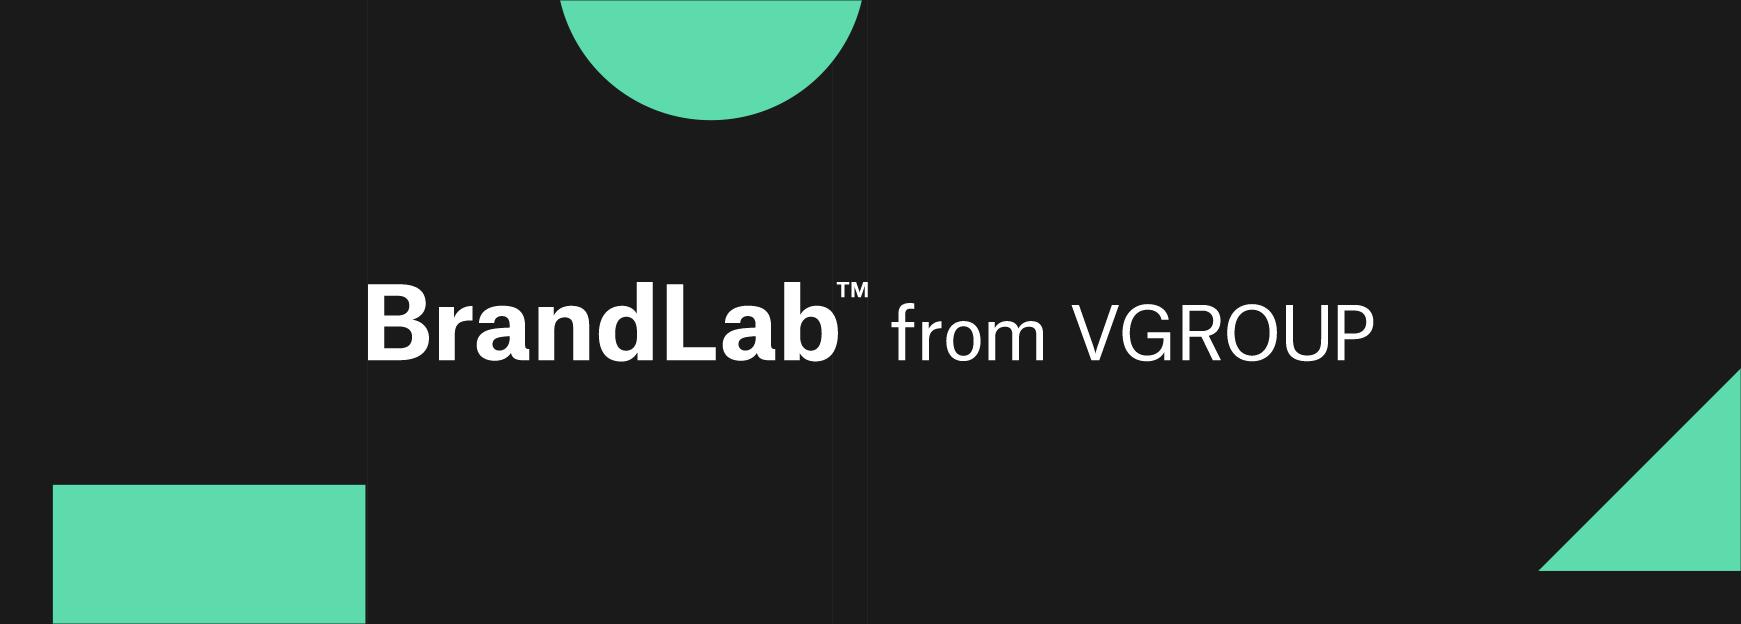 BrandLab™ from VGROUP